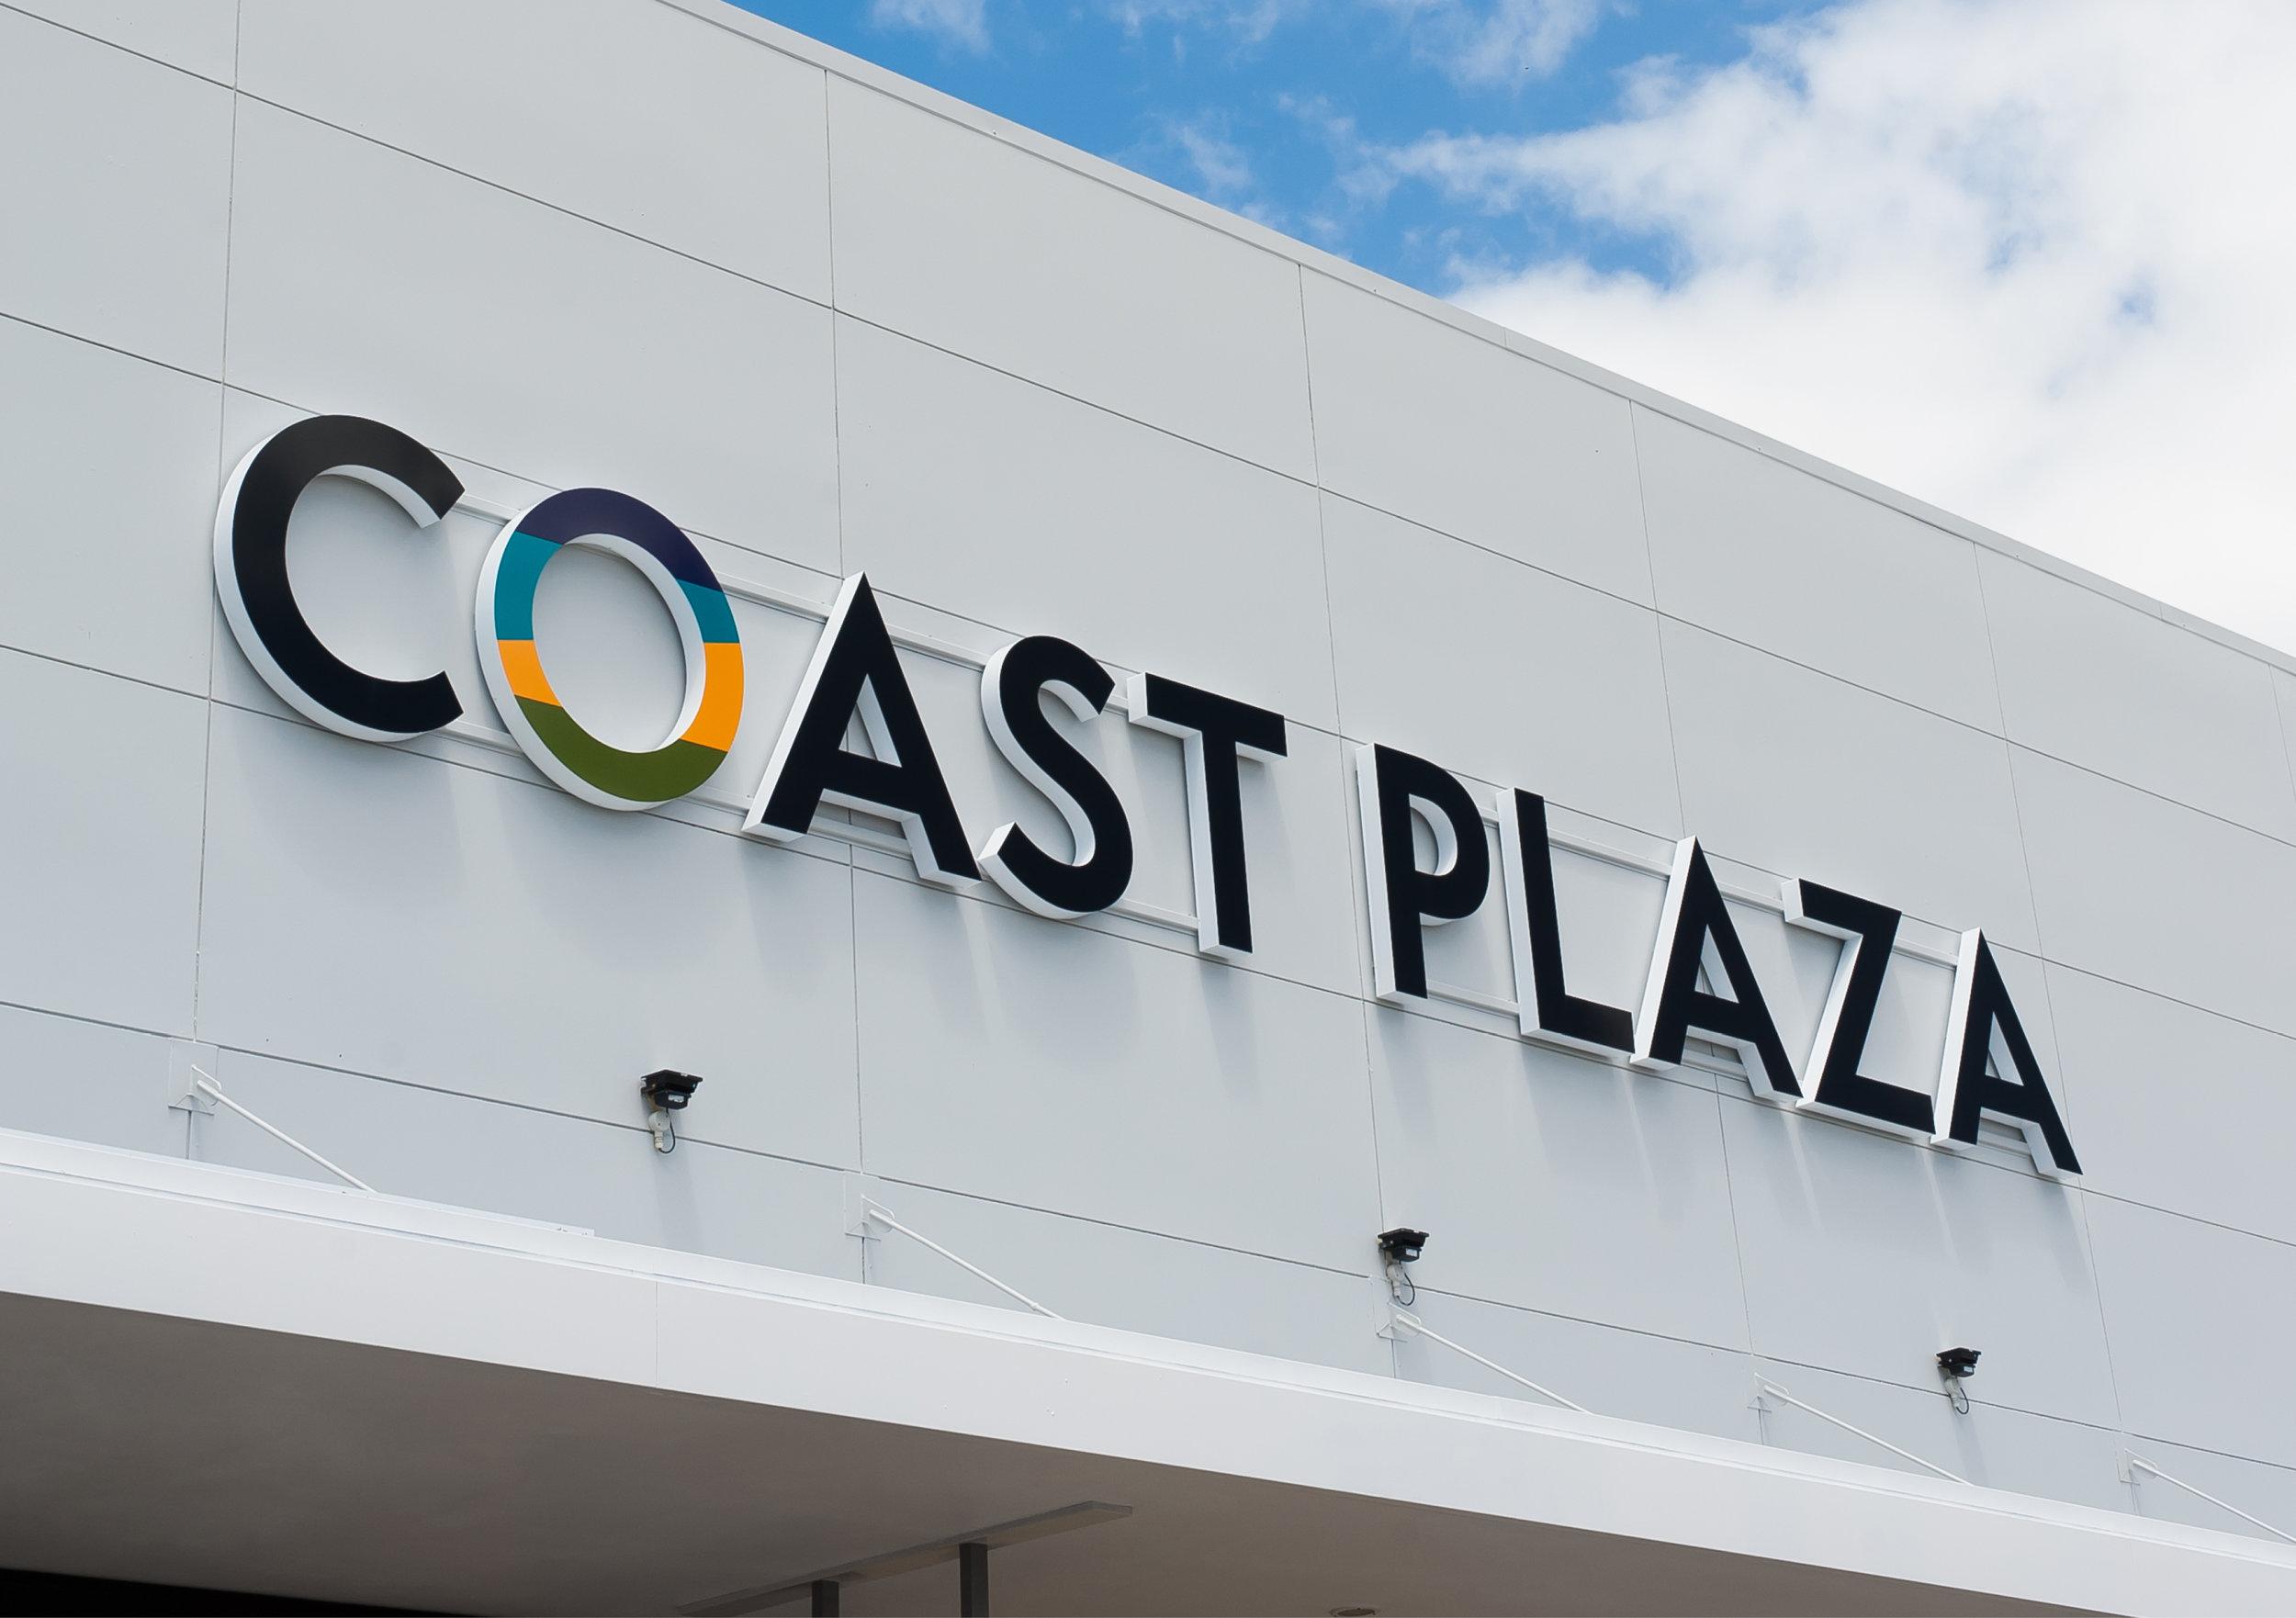 Coast Plaza